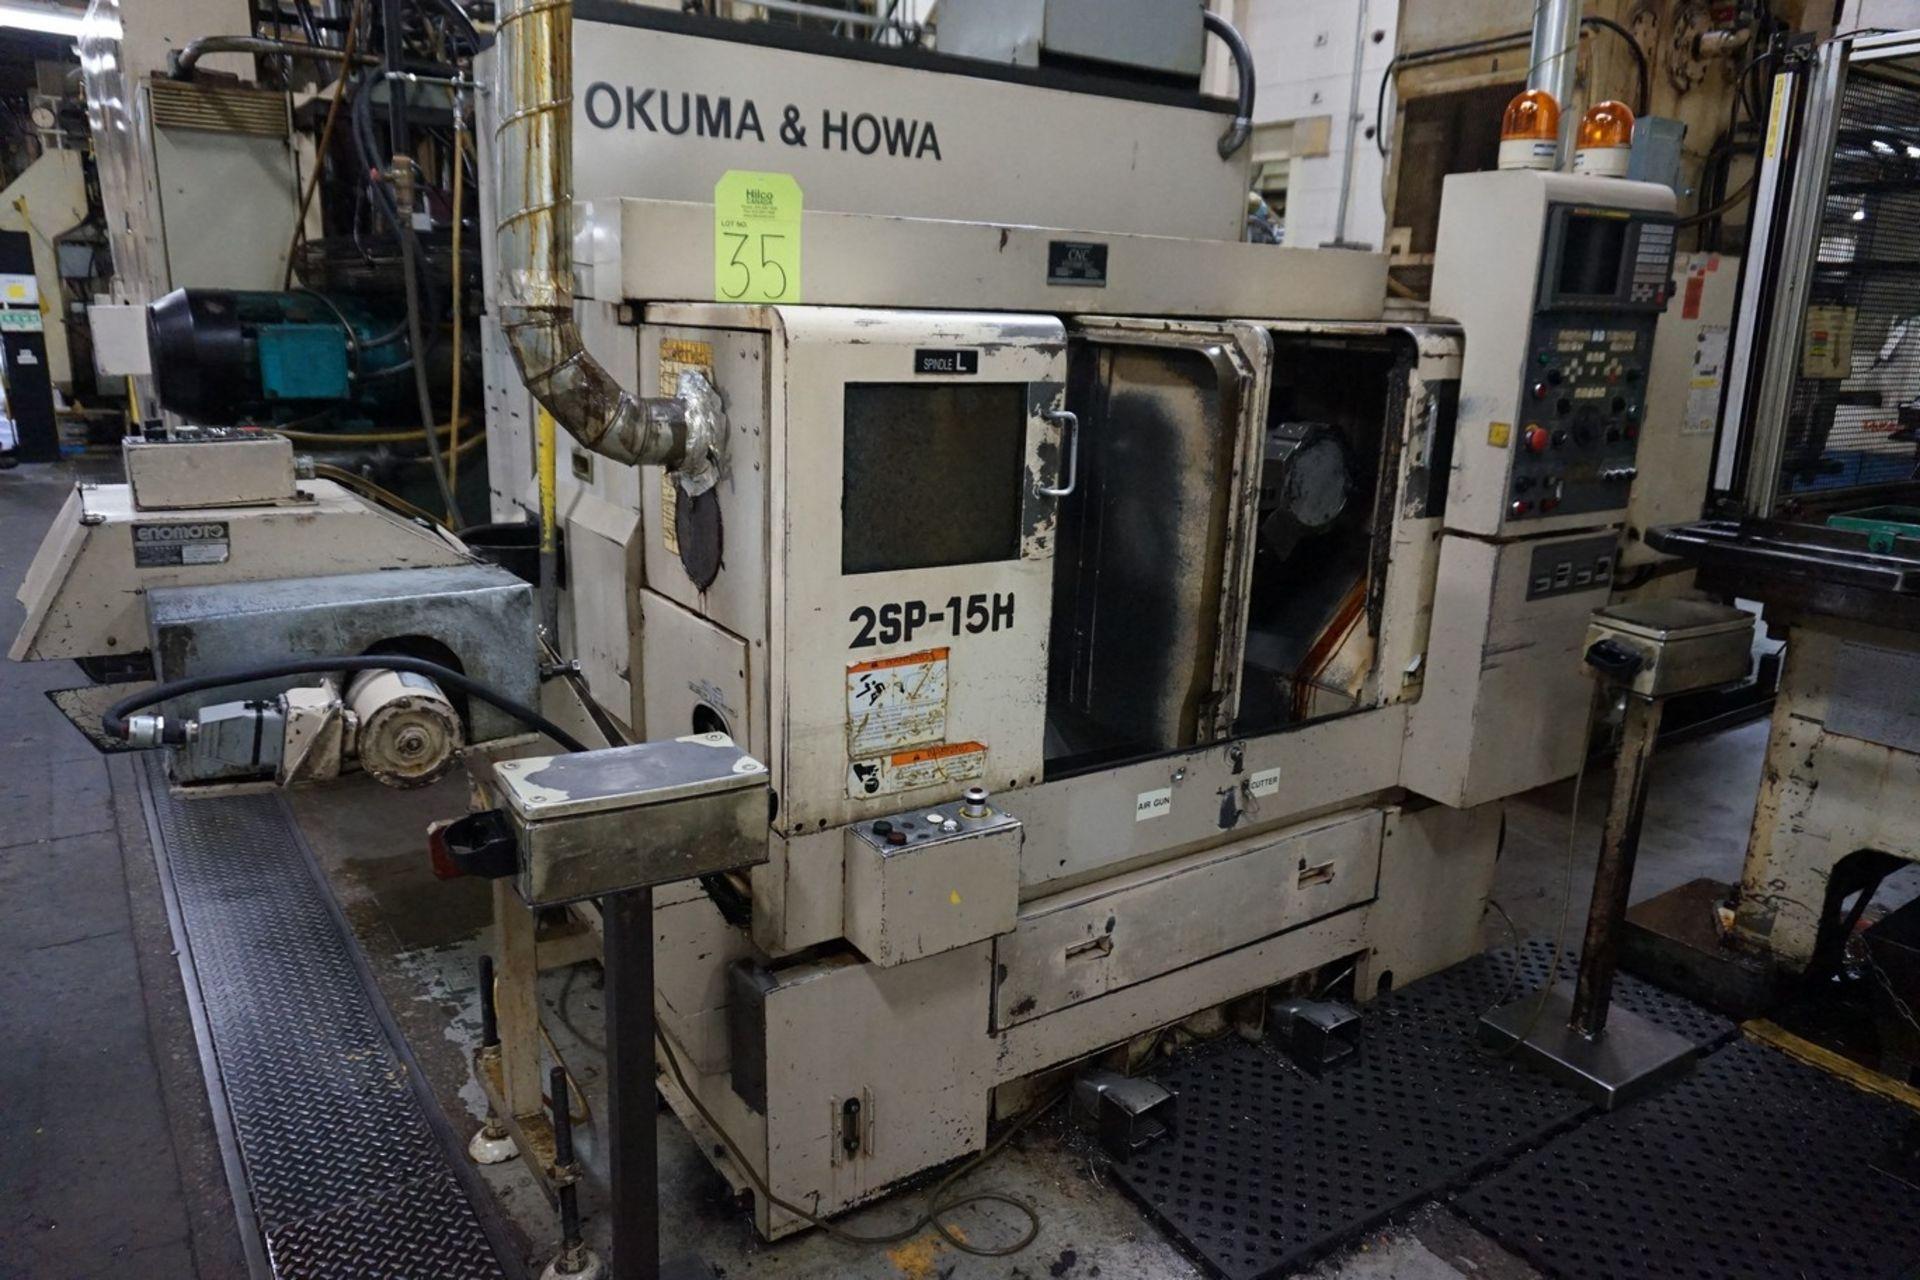 Okuma-Howa Model 2SP-15H CNC Lathe c/w Fanuc 18-TT Controller, Transformer